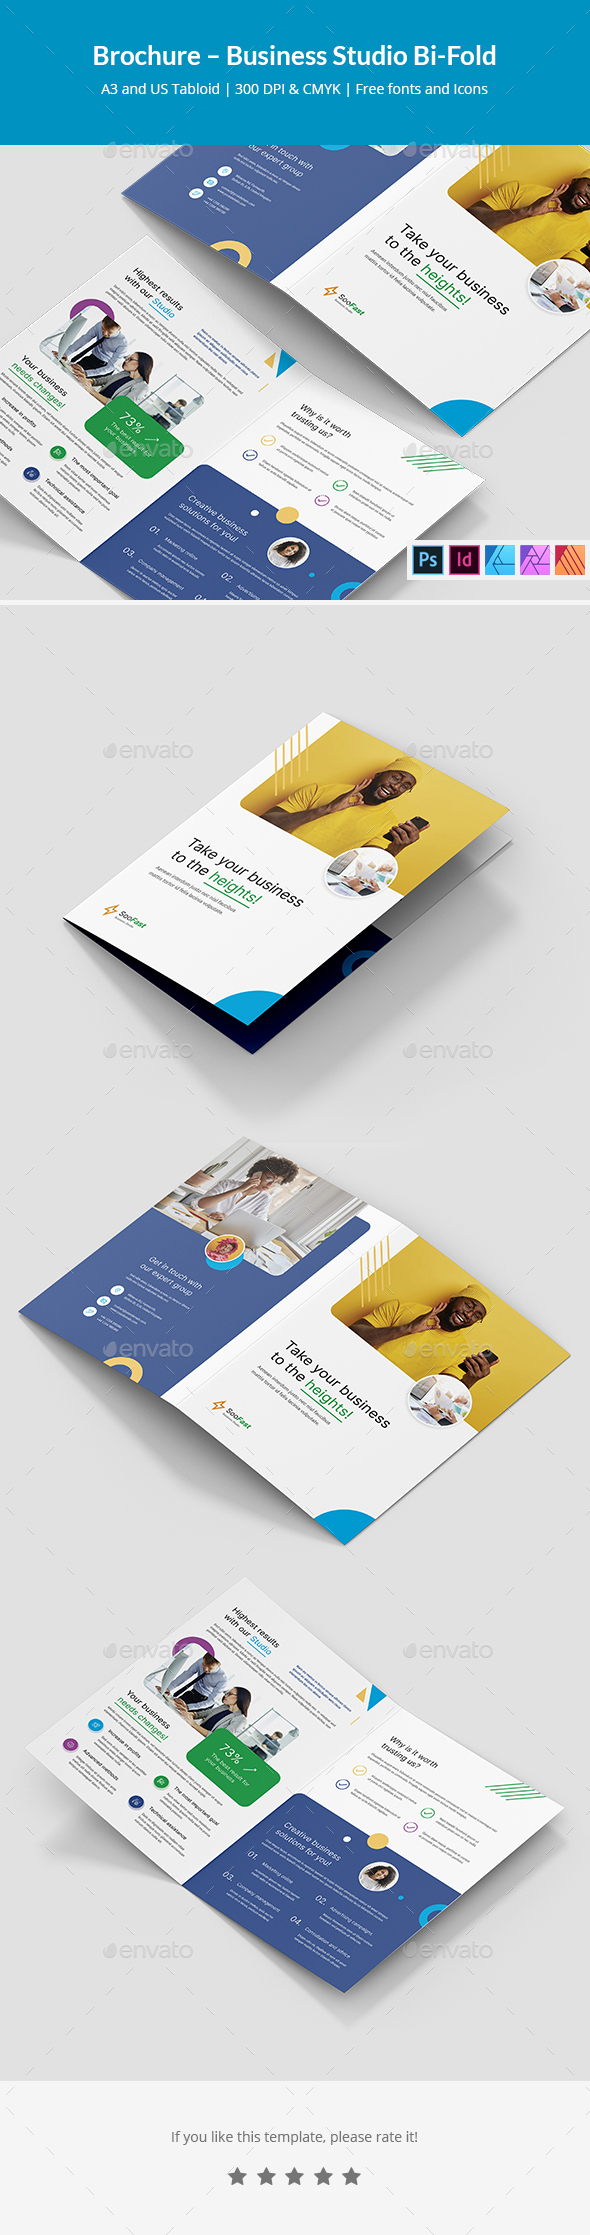 Brochure – Business Studio Bi-Fold